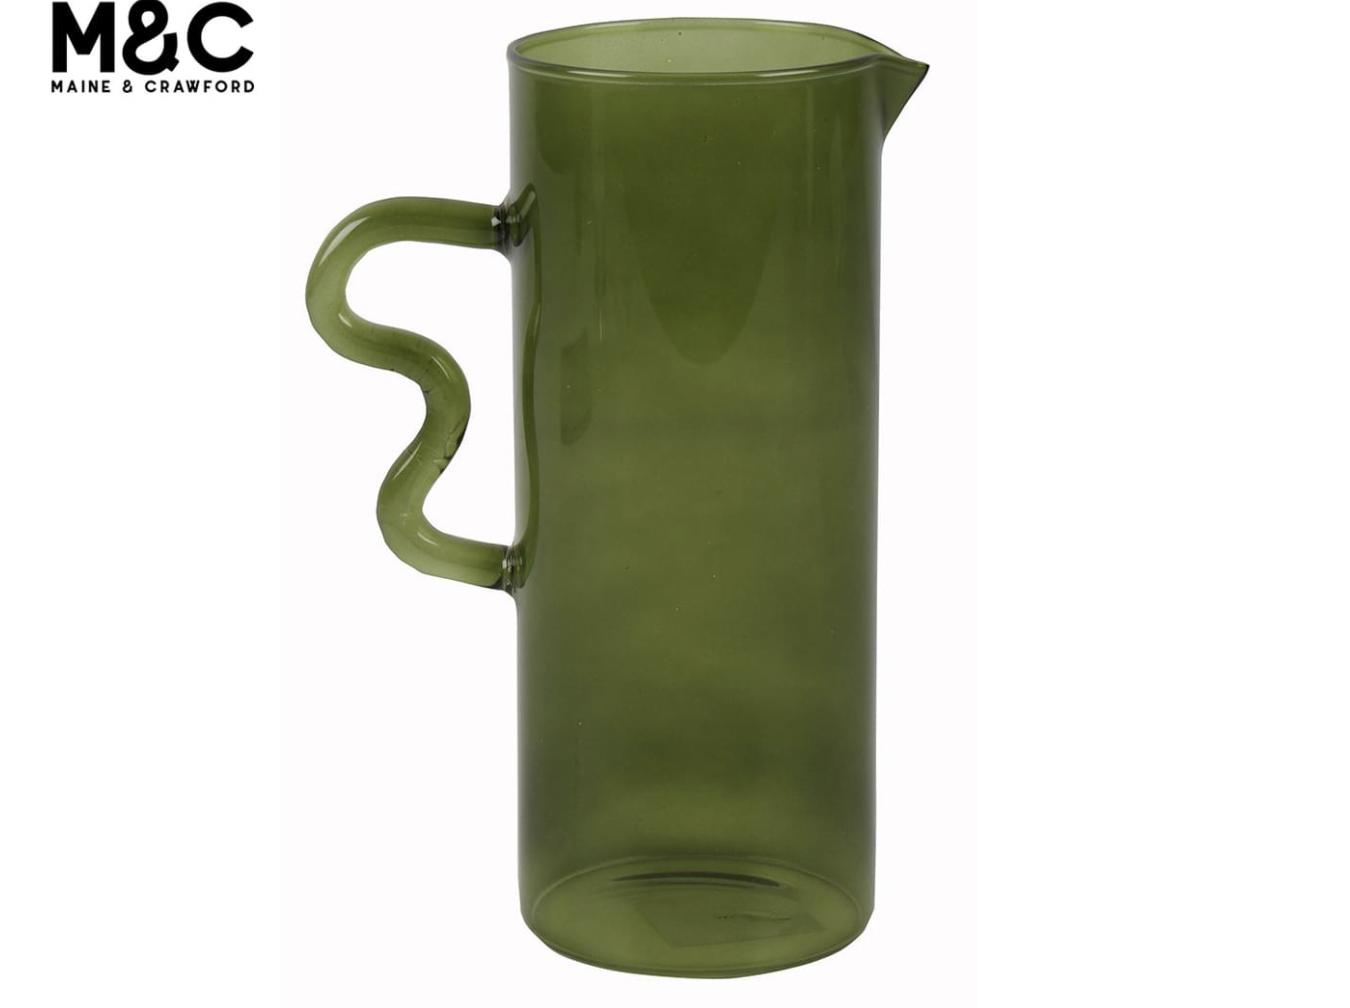 Maine & Crawford 20x8cm Rascal Hand Blown Glass Decorative Jug - Olive